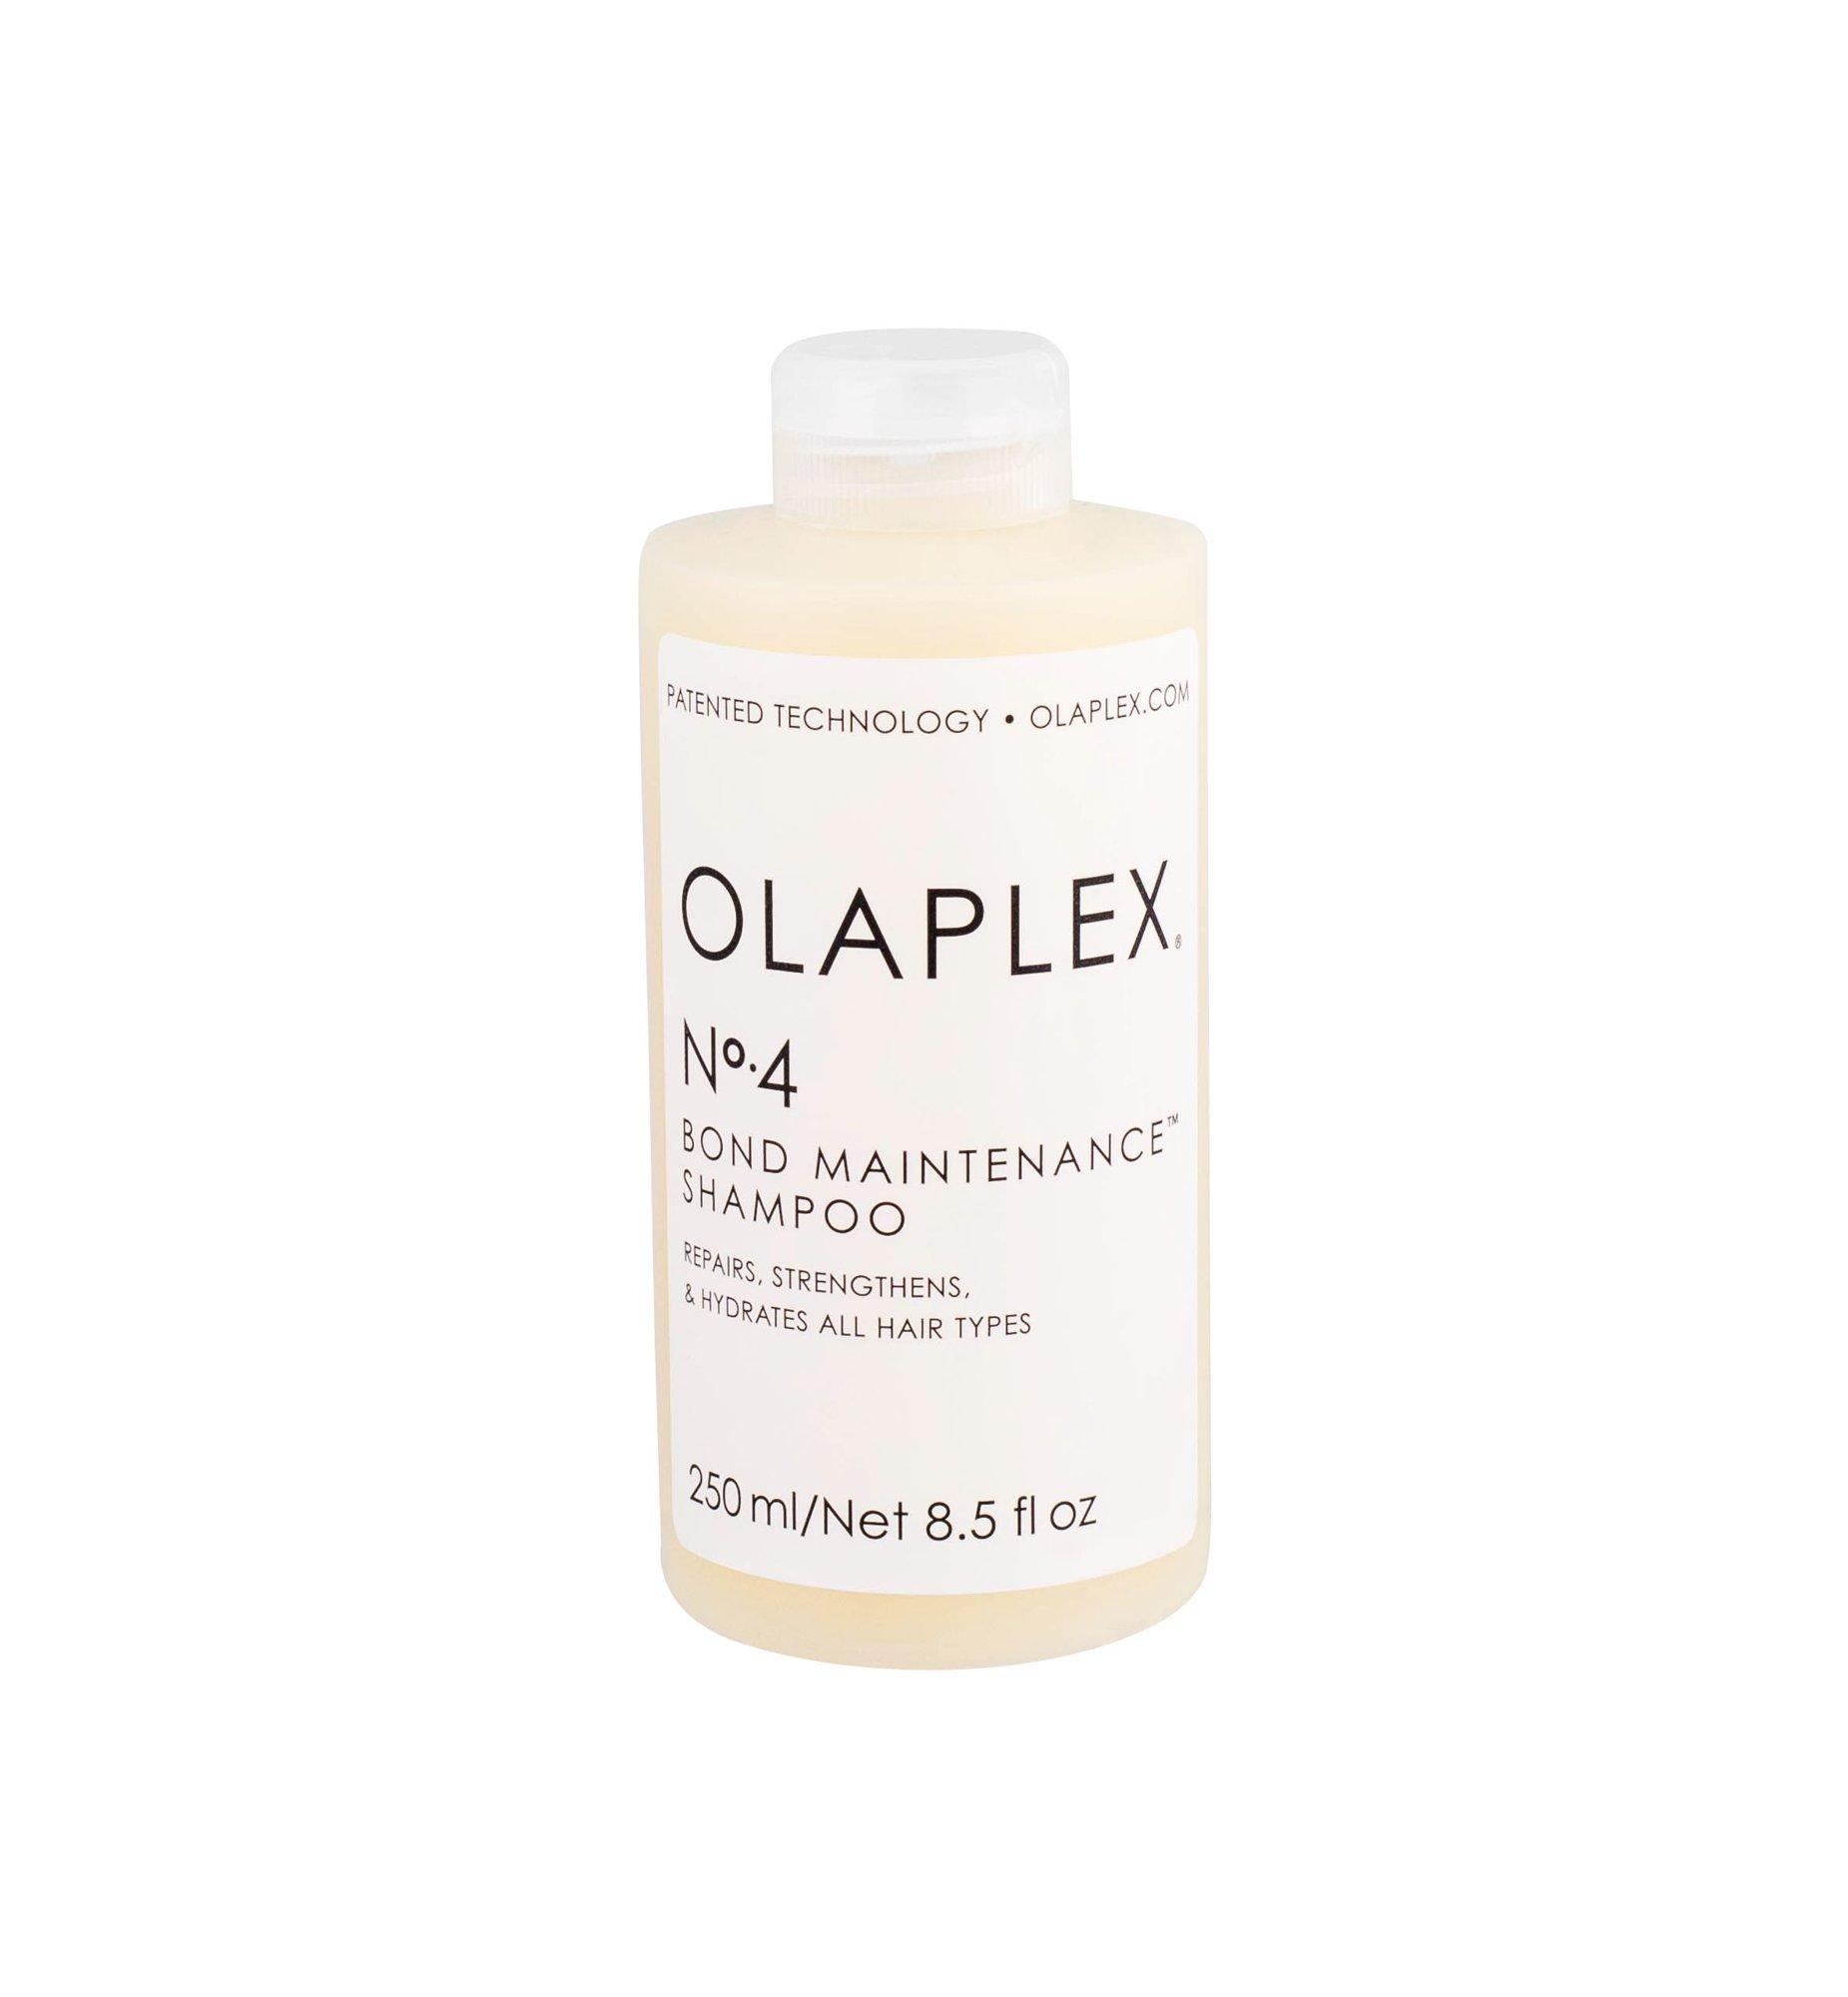 Olaplex Bond Maintenance Shampoo 250ml  No. 4